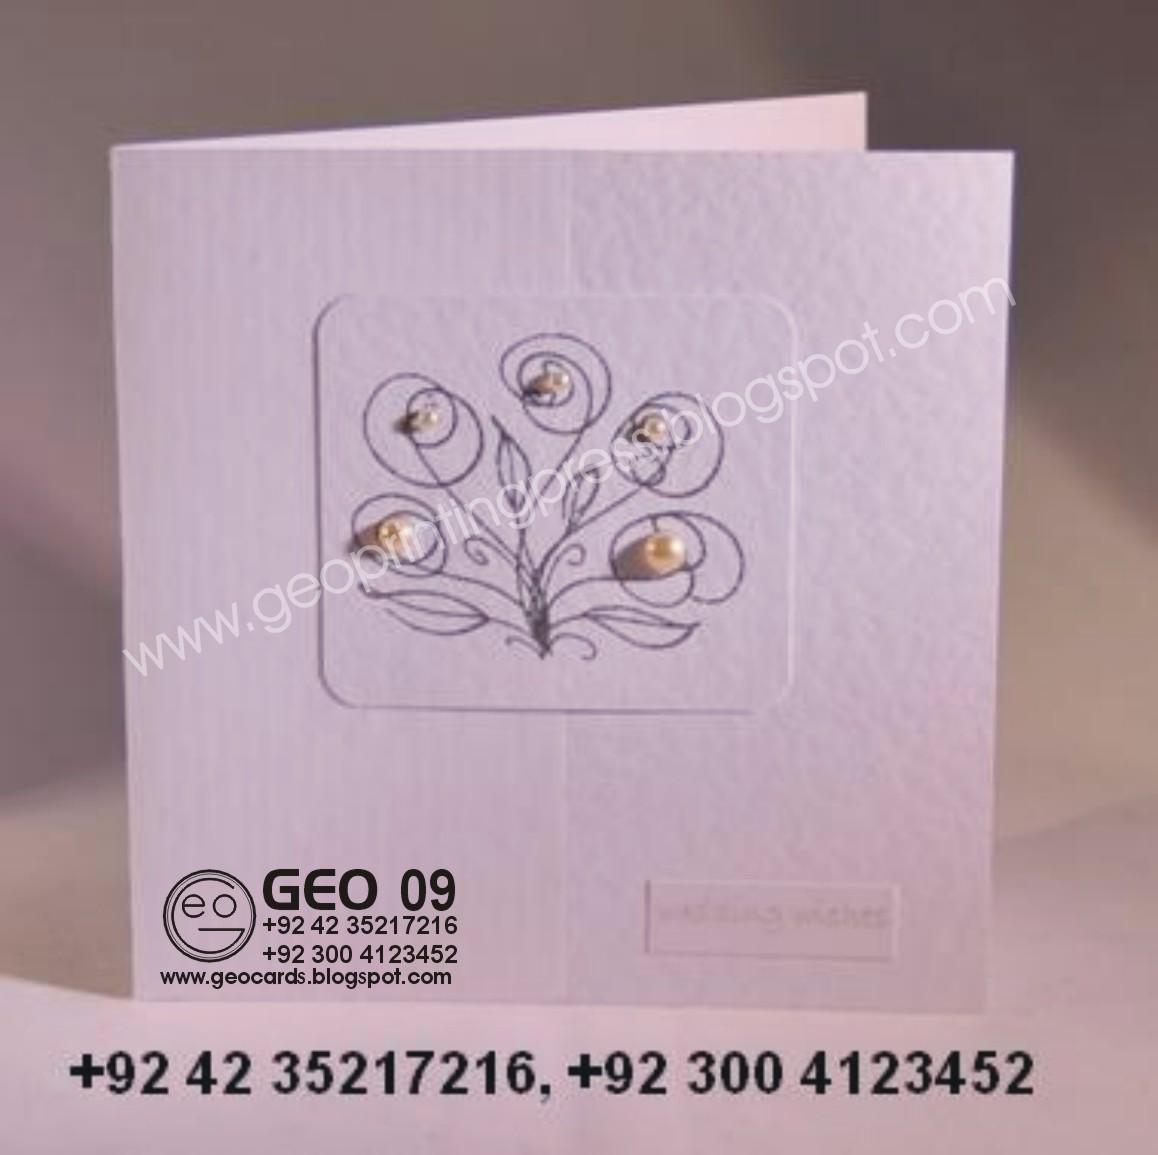 Geo printing communication wedding cards m4hsunfo